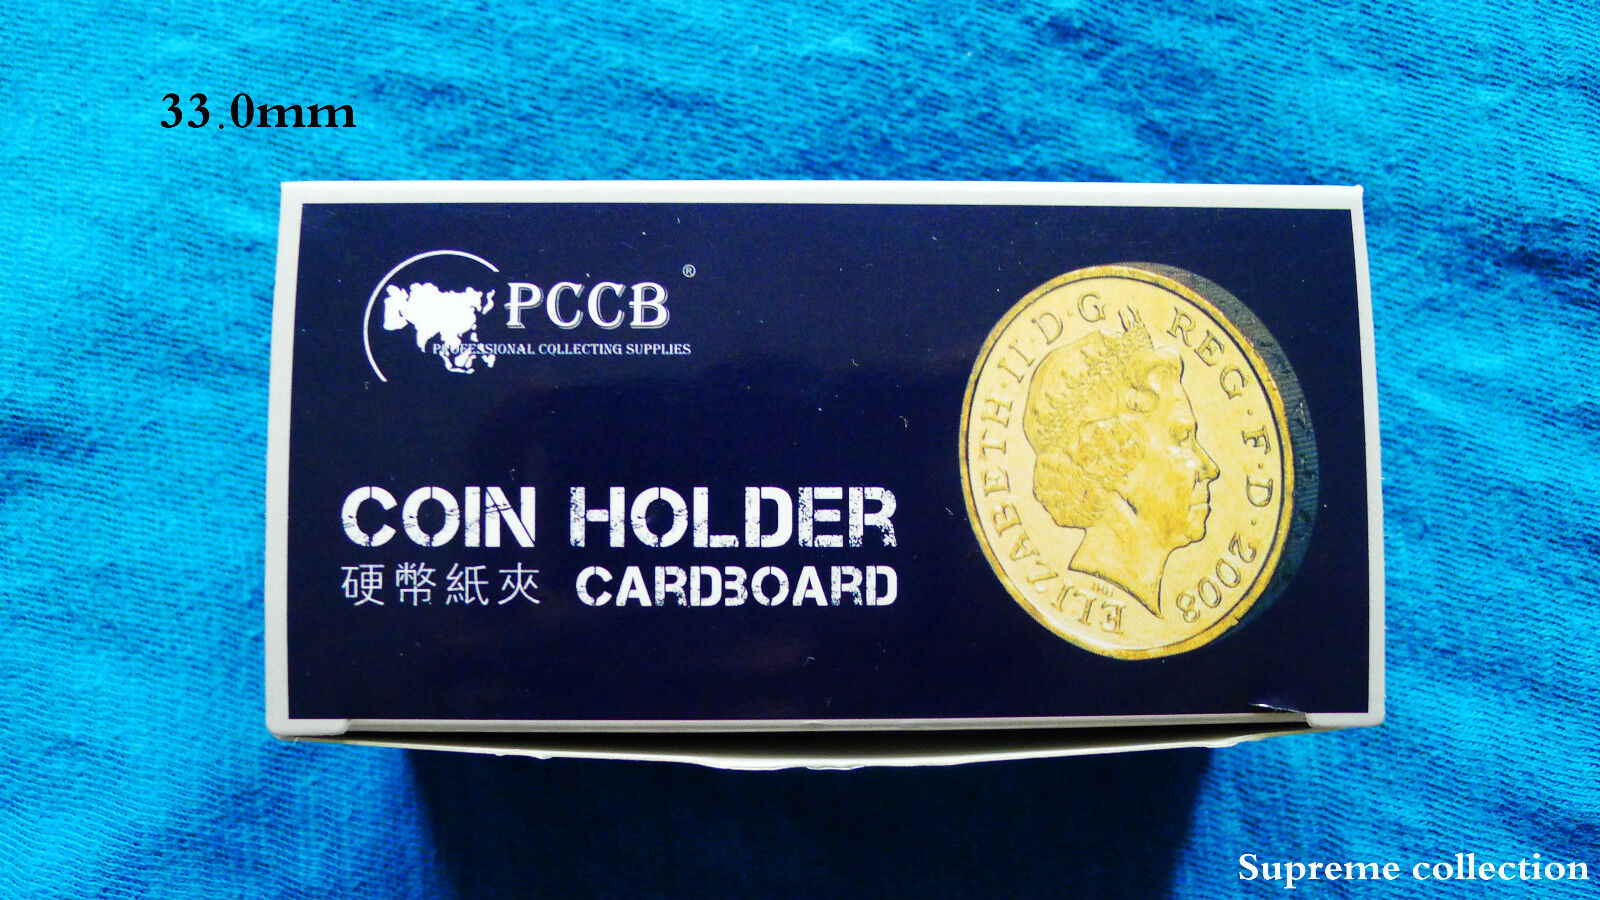 NEW 100 PCS COIN HOLDERS 2 X 2 CARDBOARD MYLAR FLIPS  DIAMETER 33MM NEW